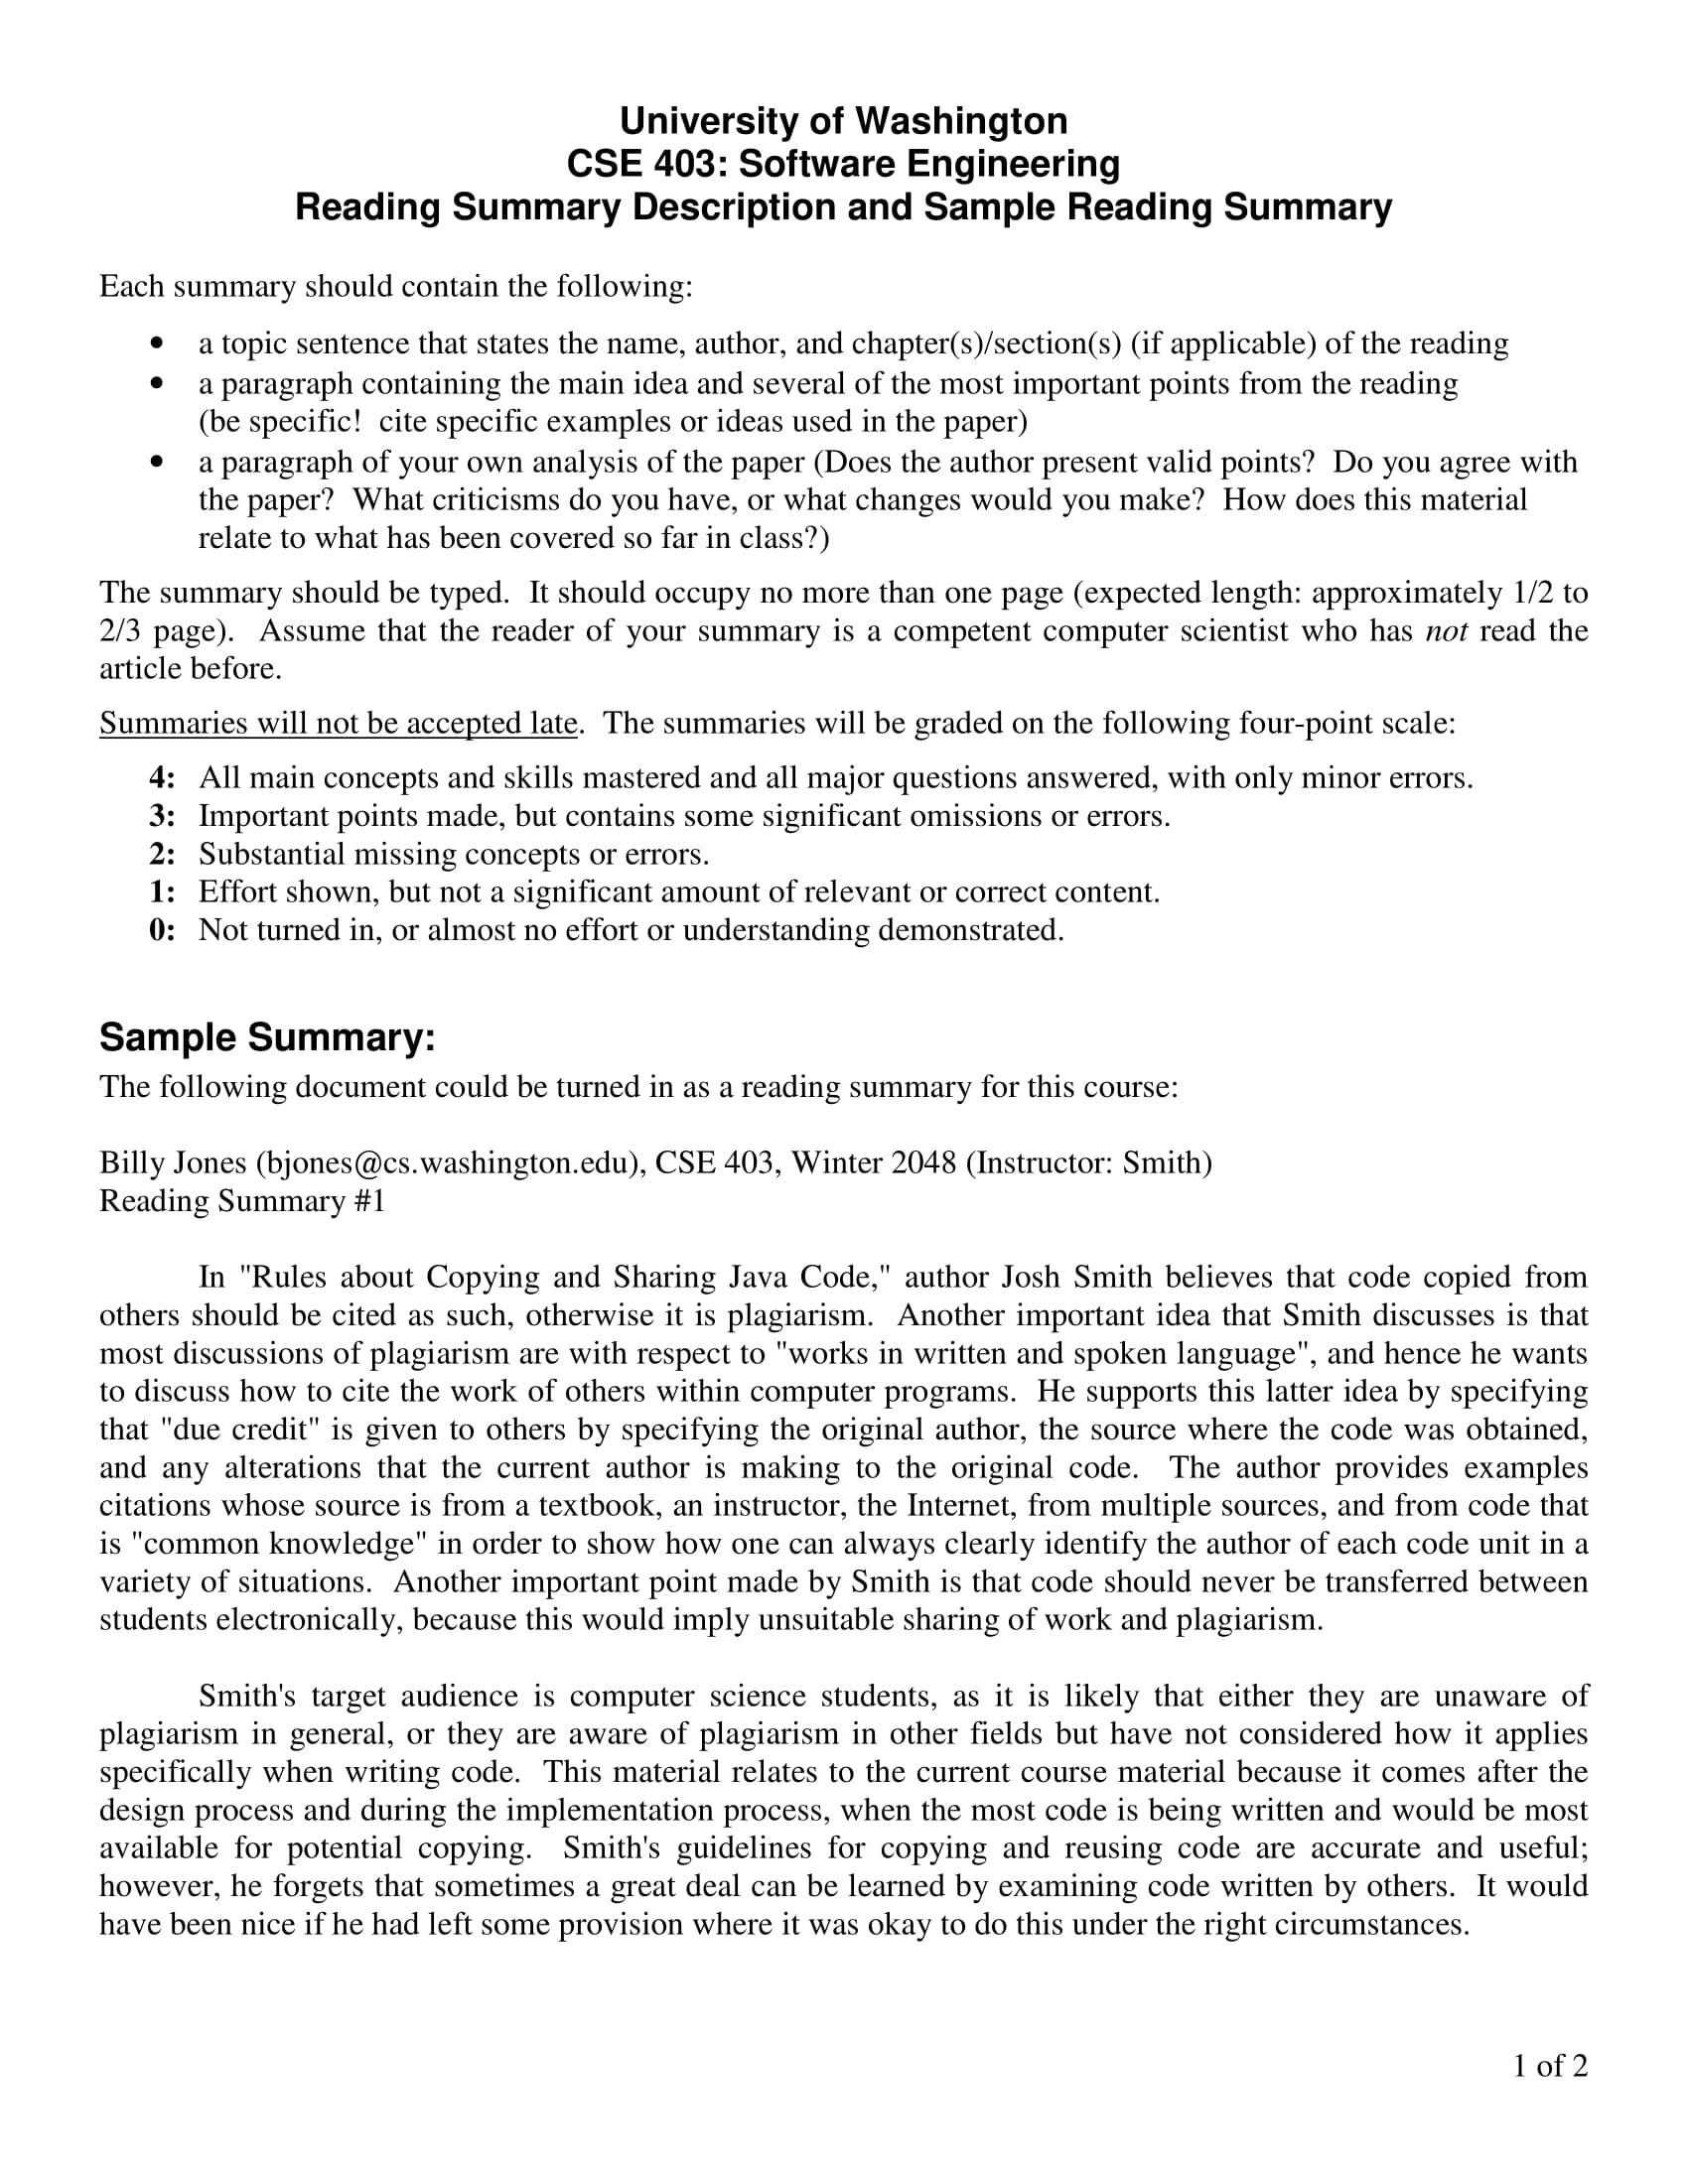 sample reading summary